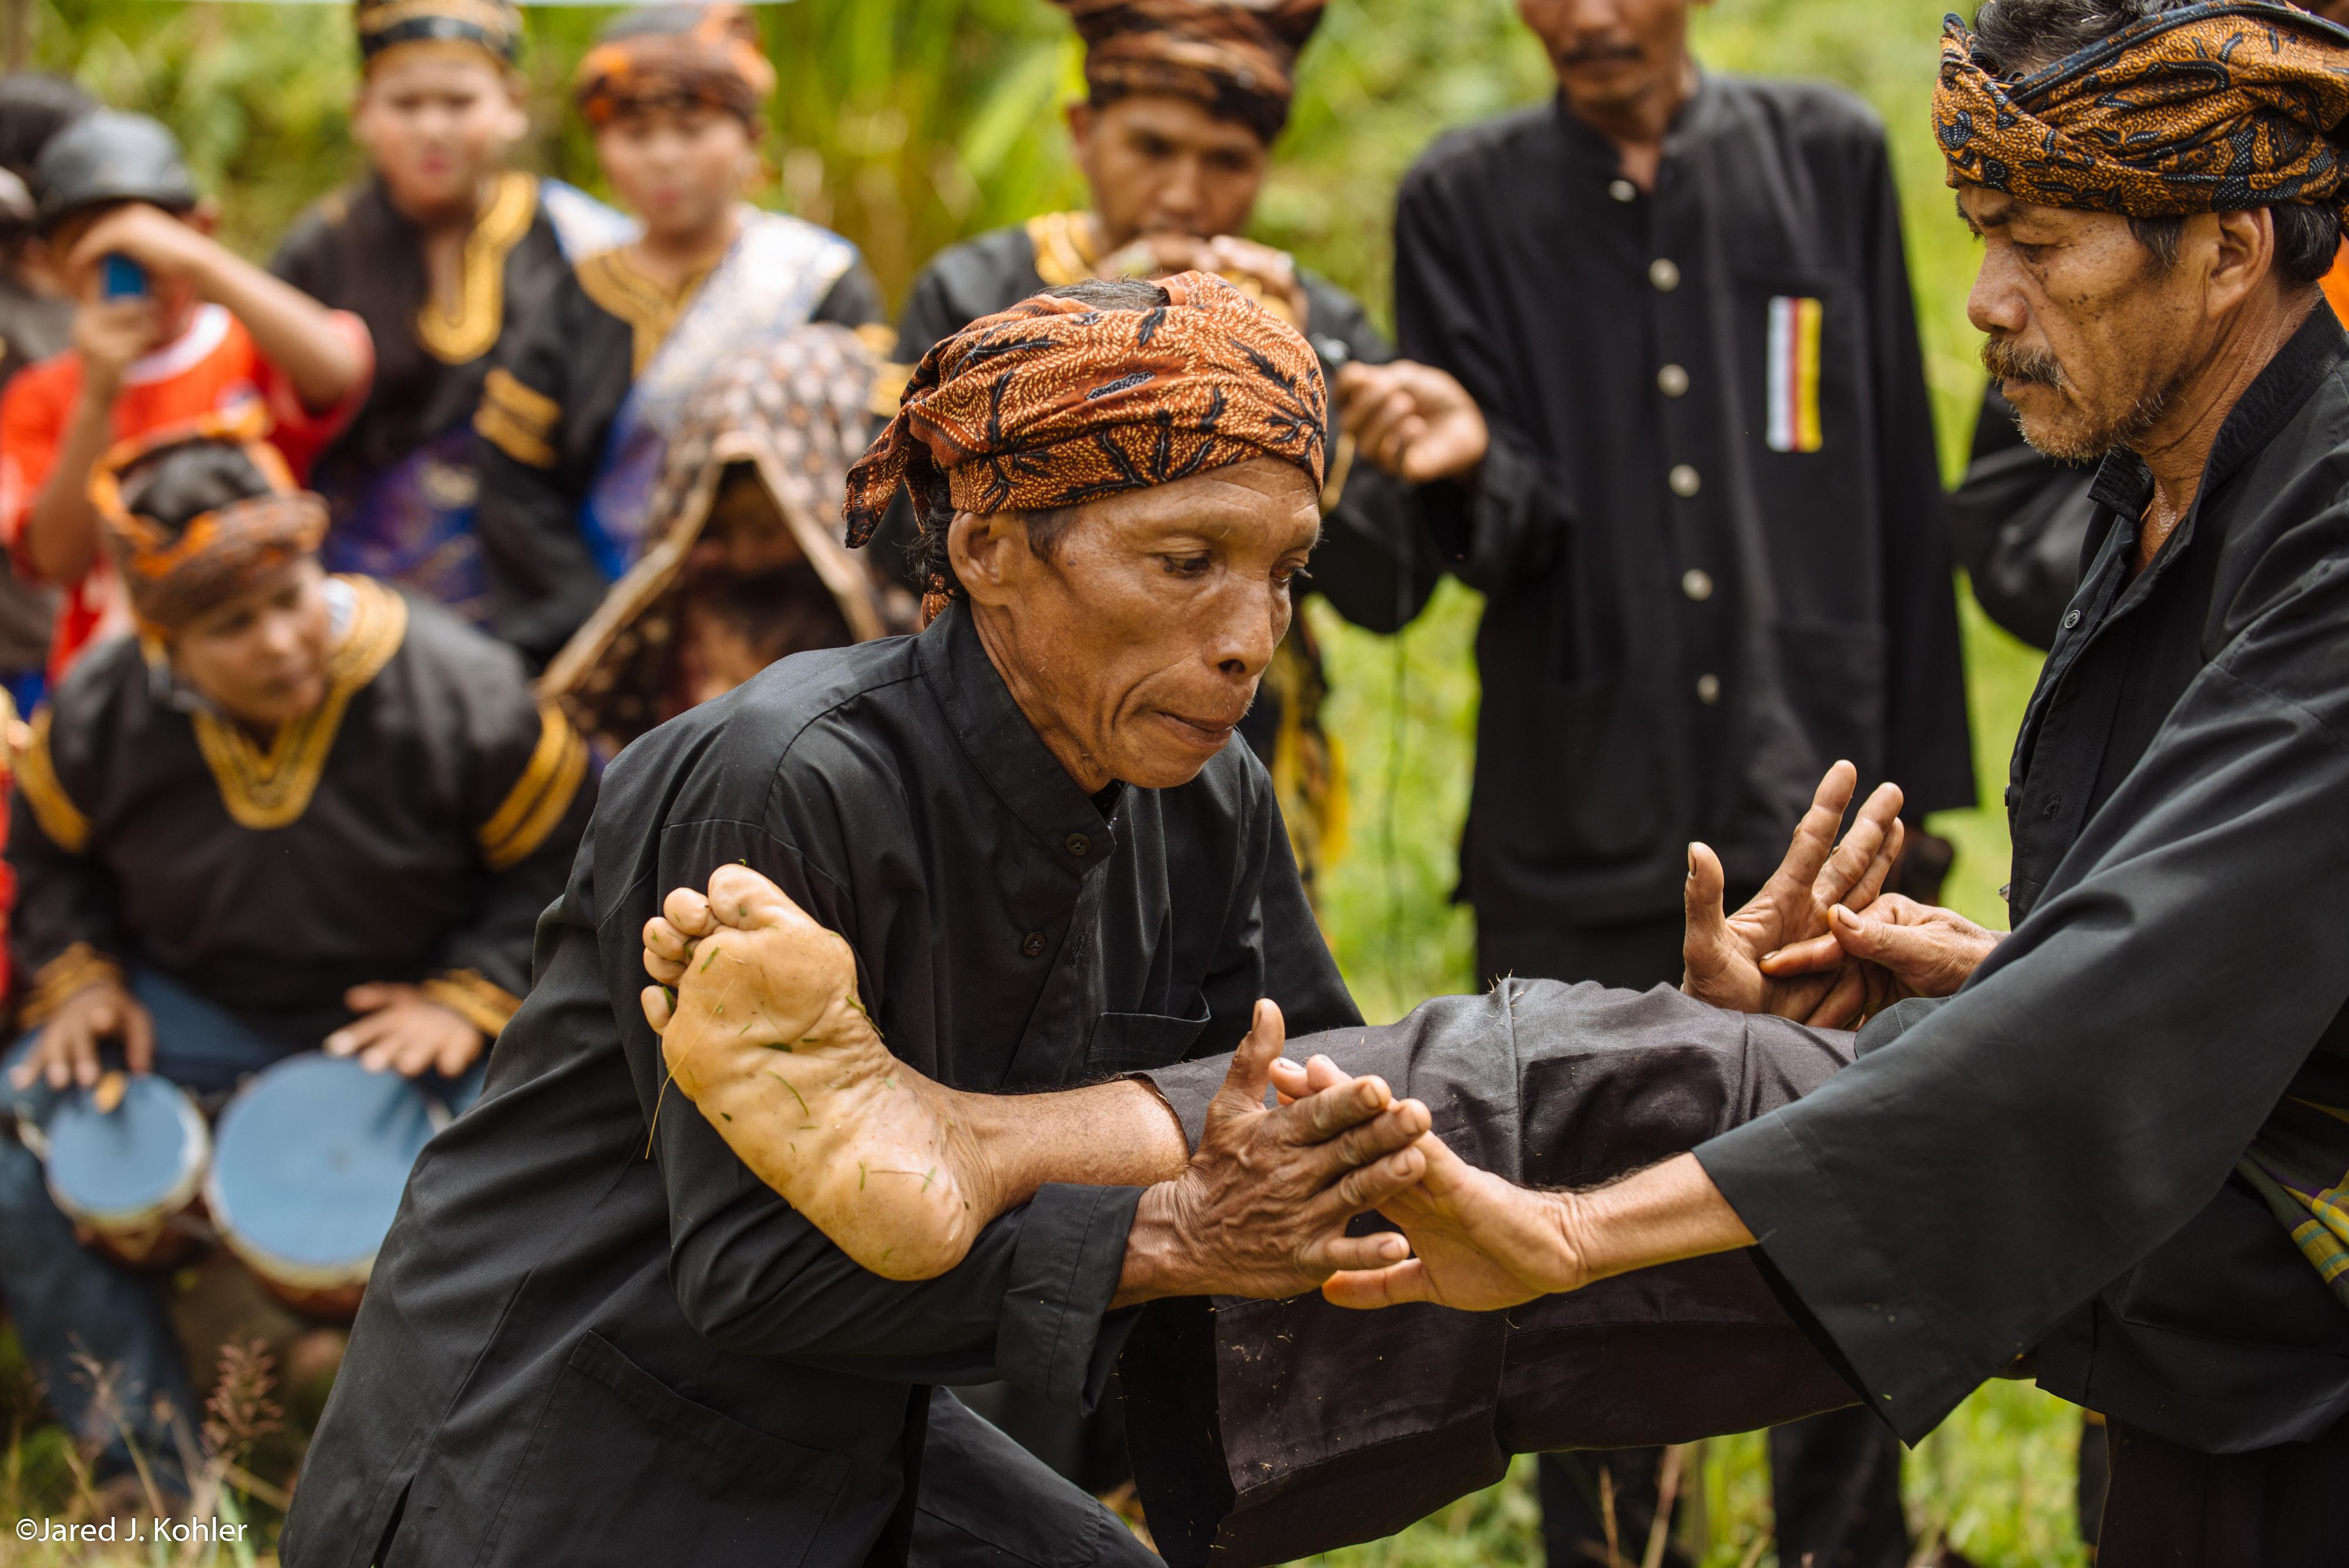 Padang-Pariaman, Sumatra, Indonesia